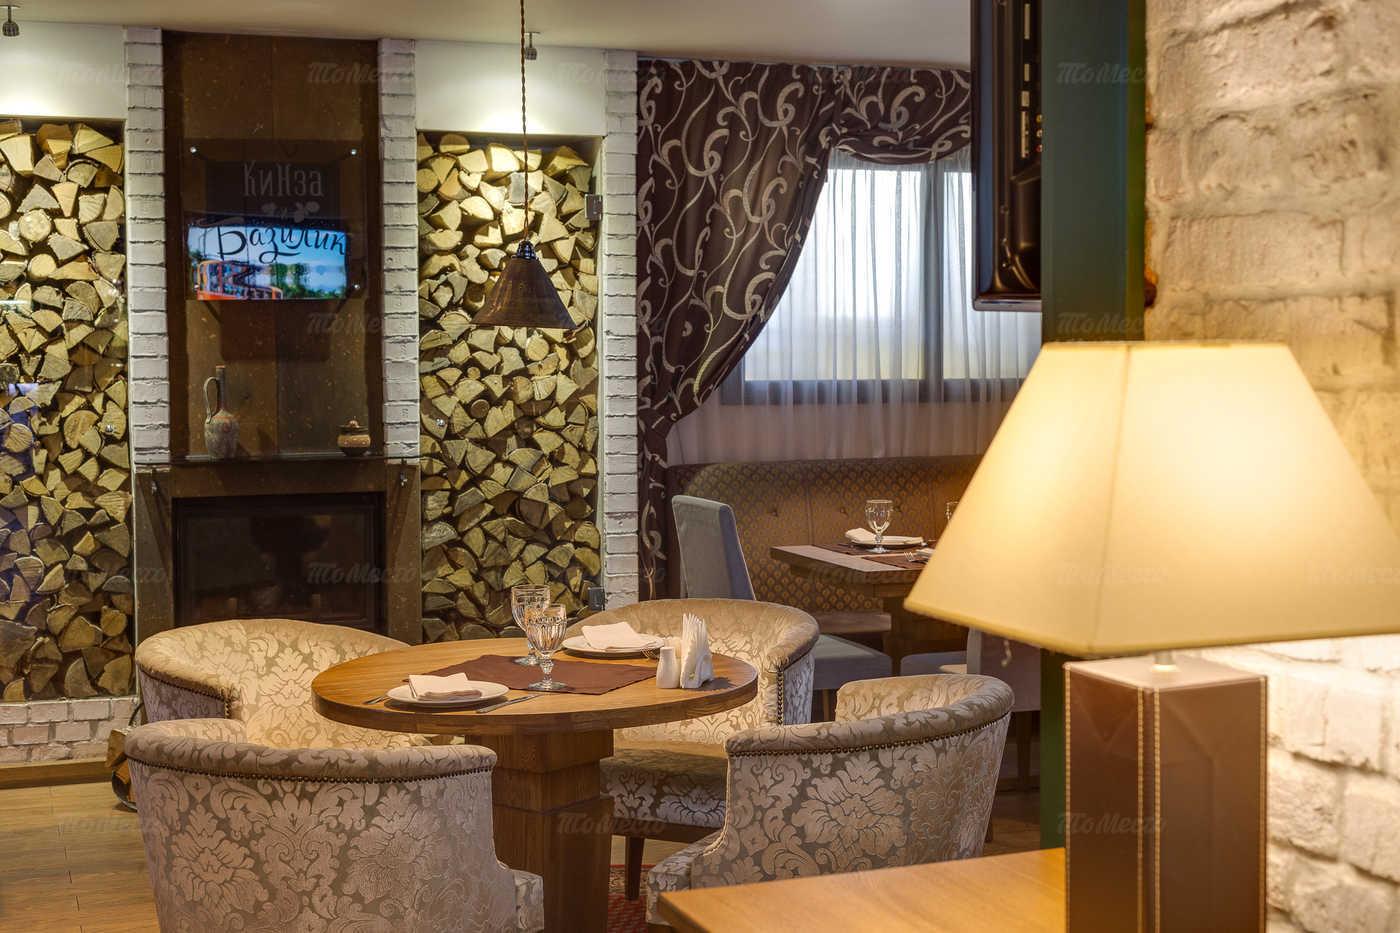 Меню ресторана Кинза и Базилик на Свердлова